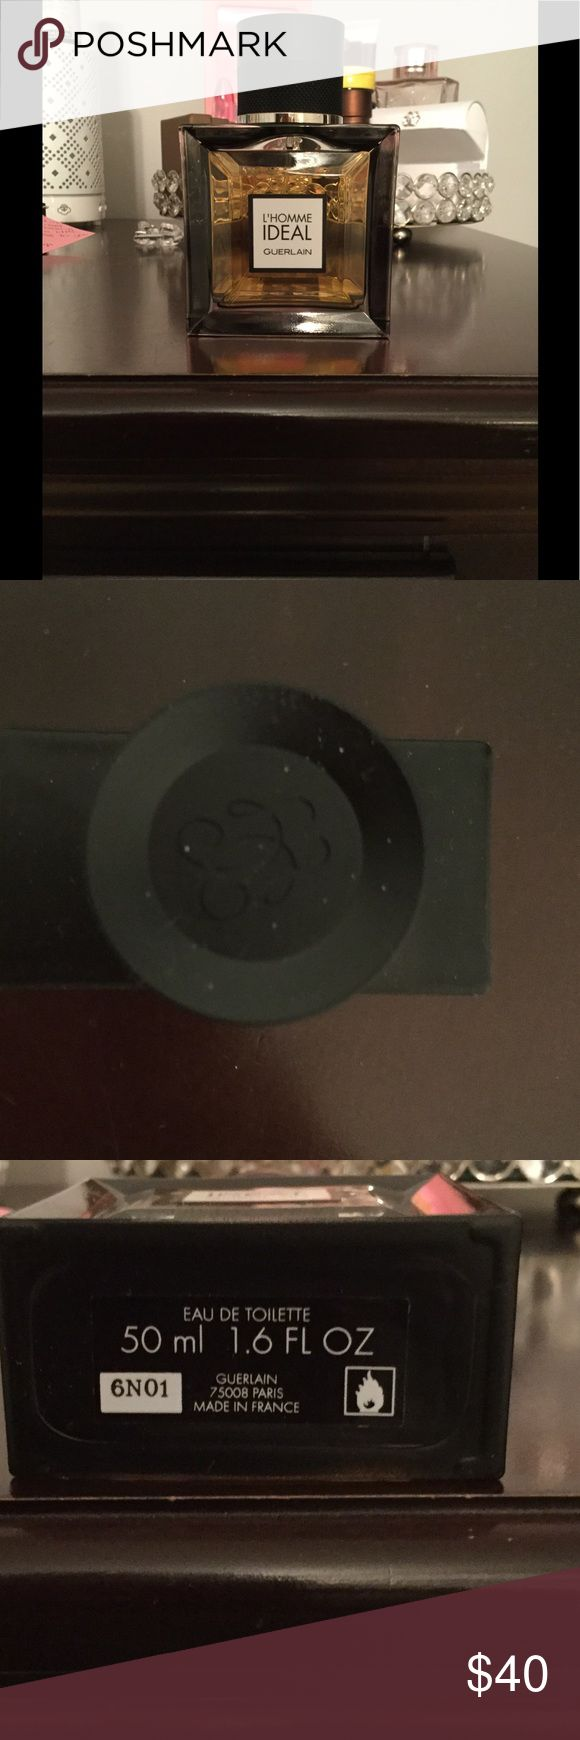 Men's cologne 50 ml Eau de toilette, L' Homme Ideal by Guerlain, barely used, scents of woods & almond guerlain Other